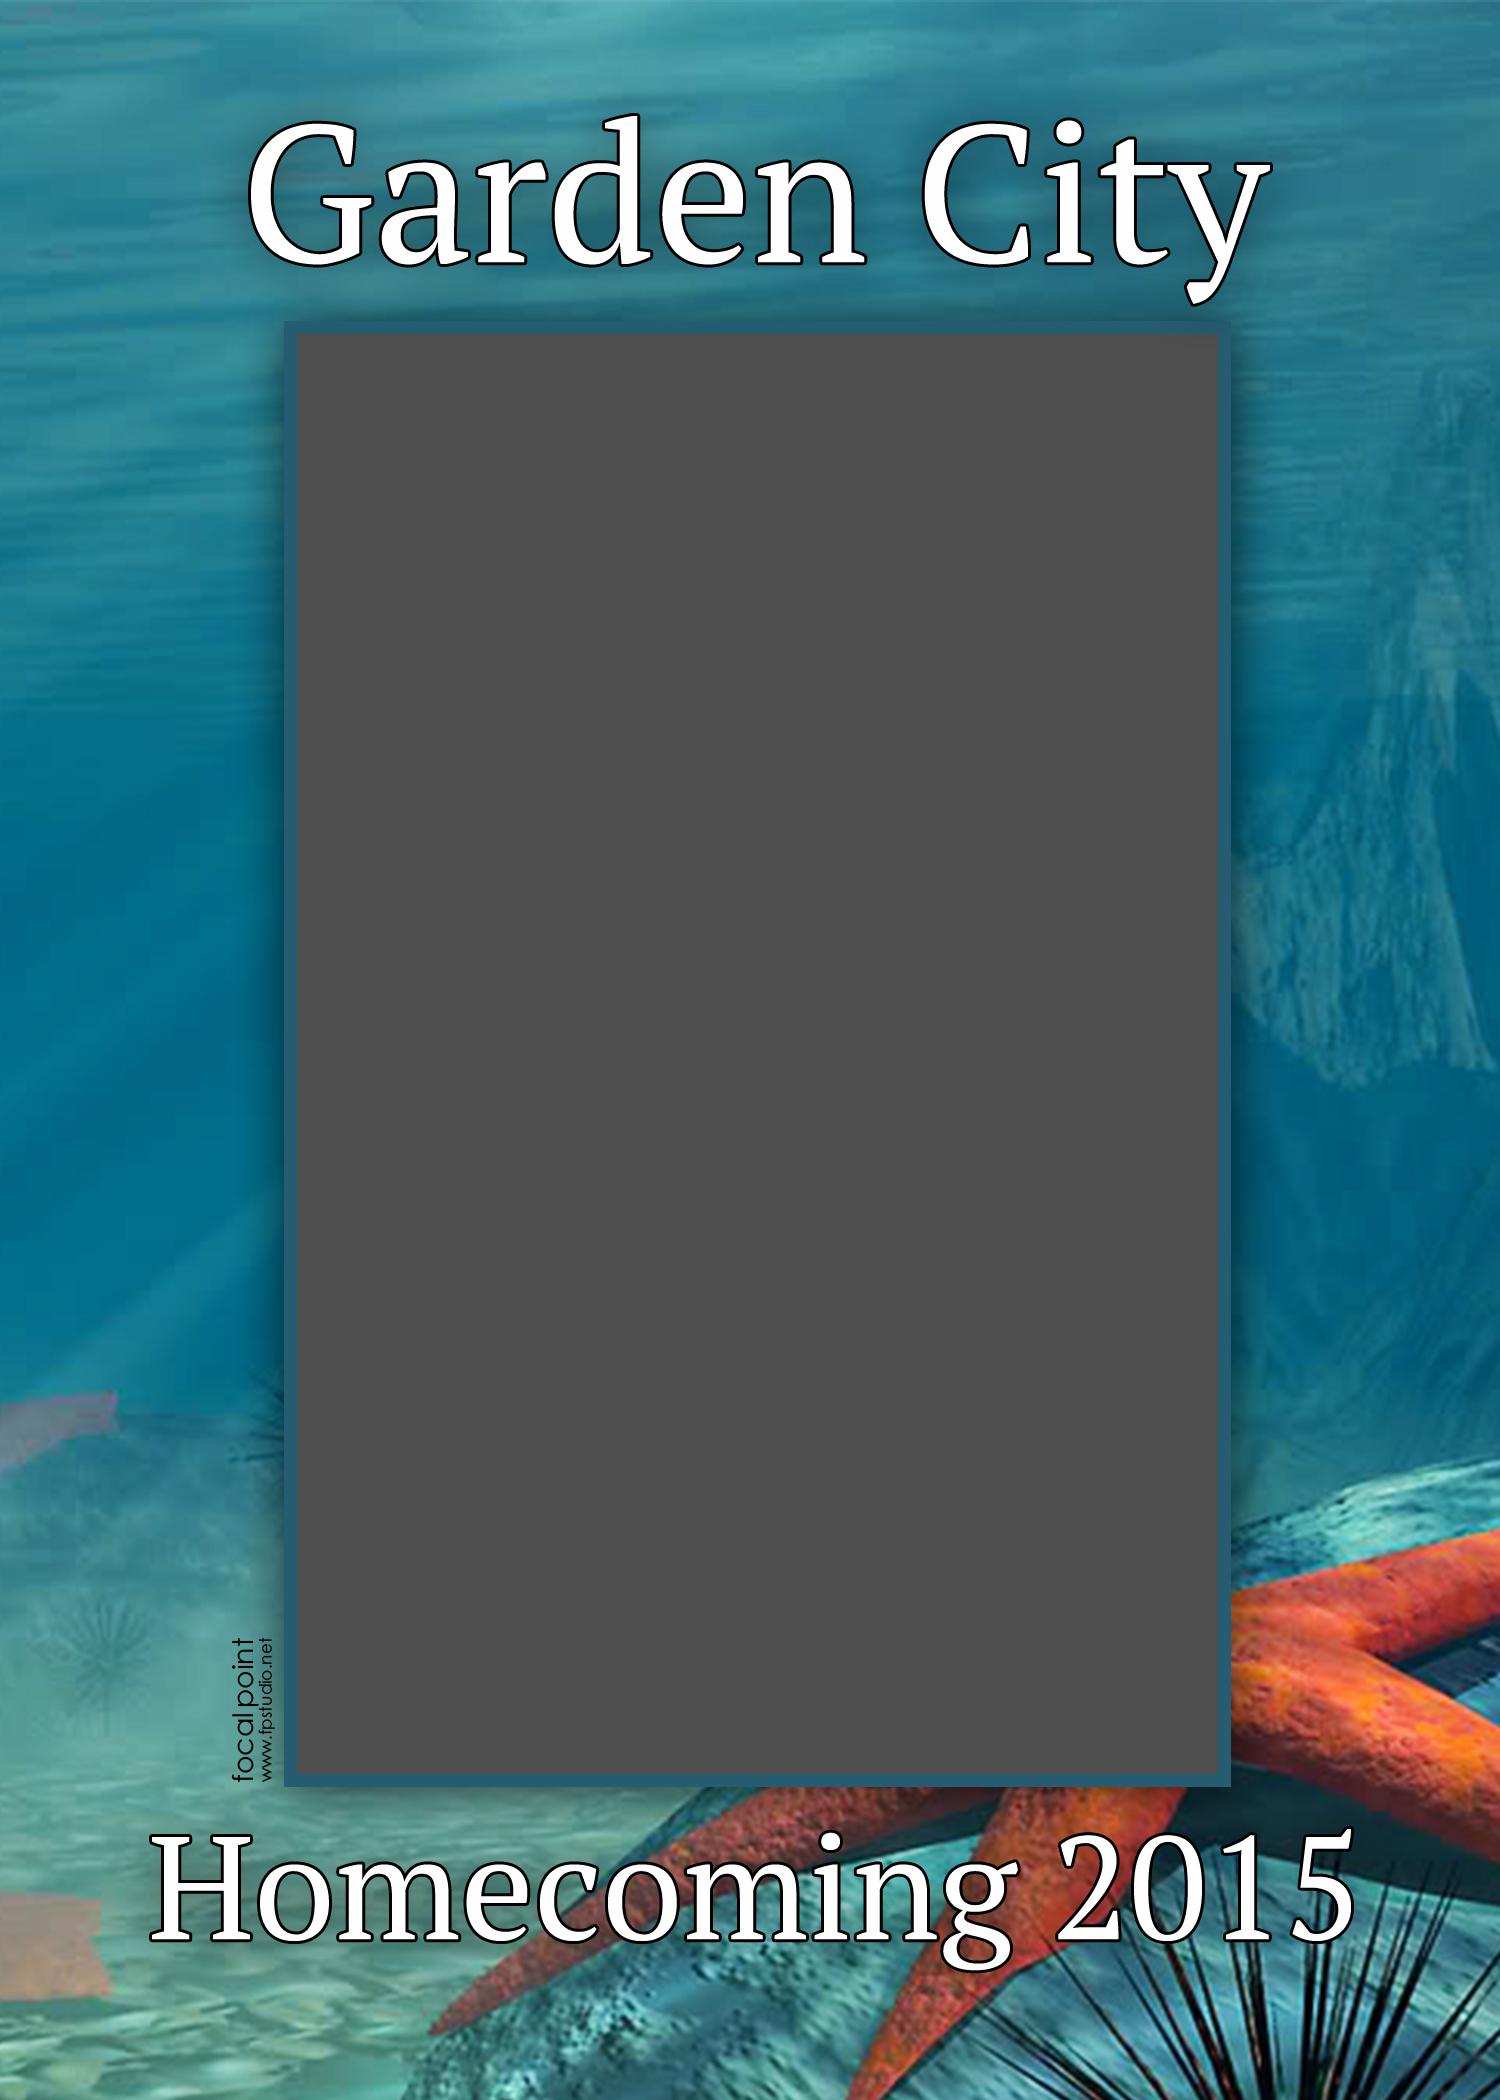 border_beach&water_1_V copy.jpg